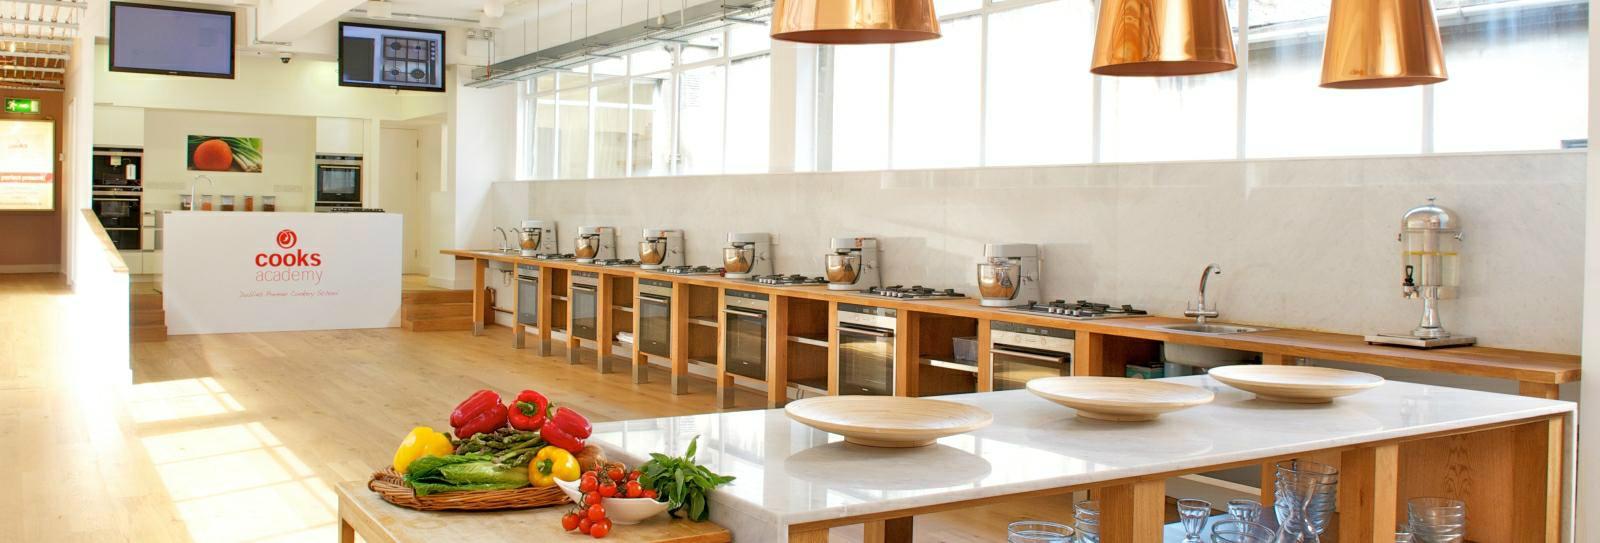 Cooks Academy